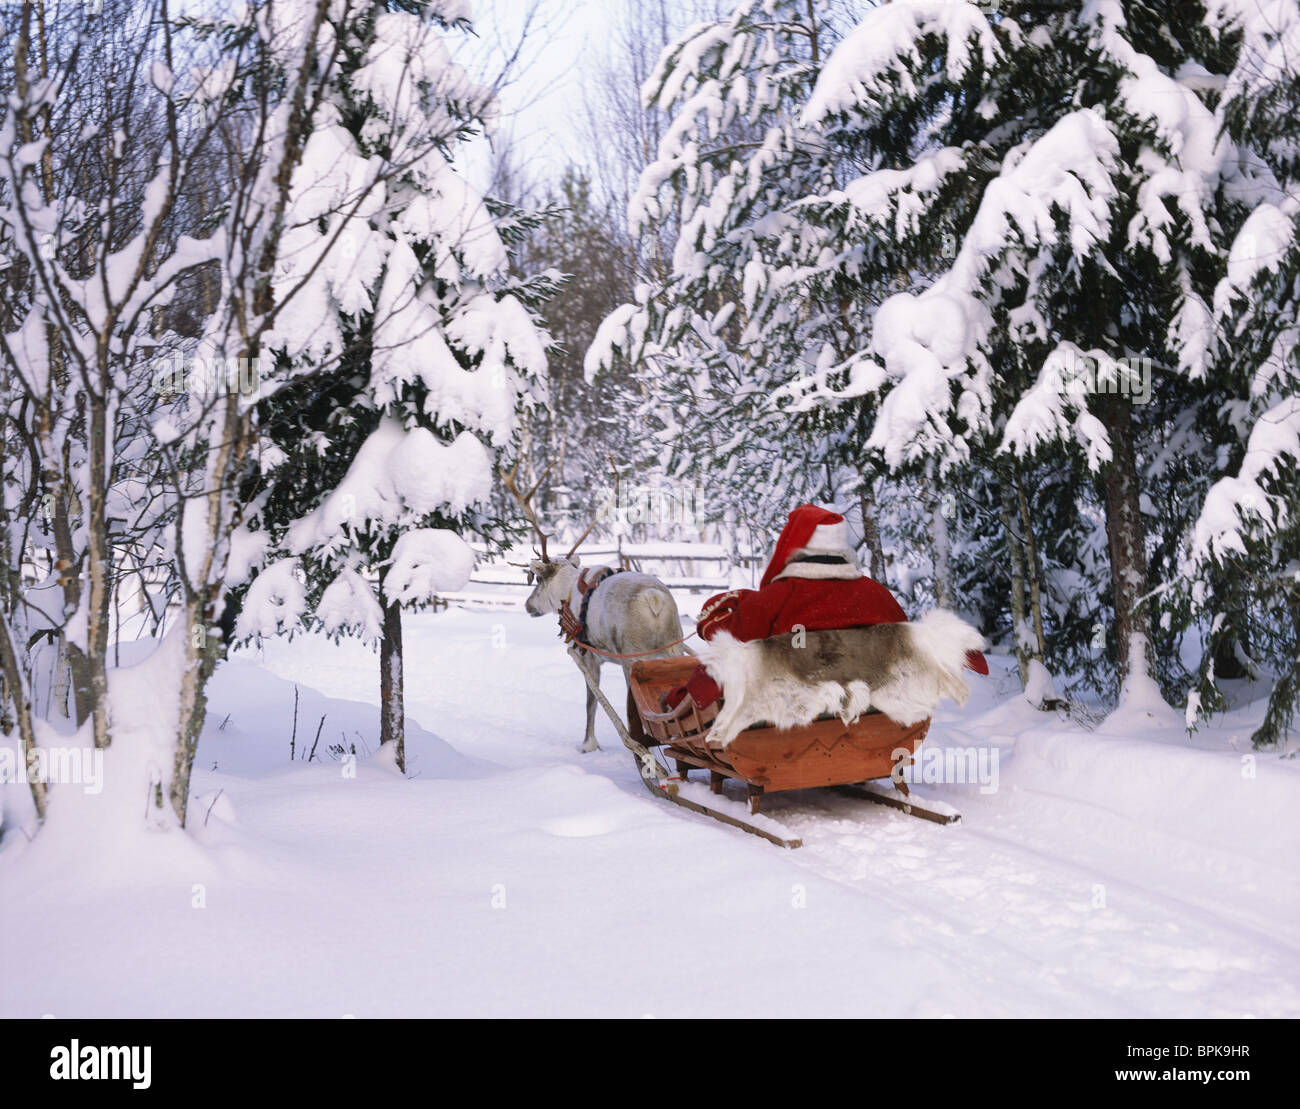 Santa Claus, Lappland, Finland - Stock Image